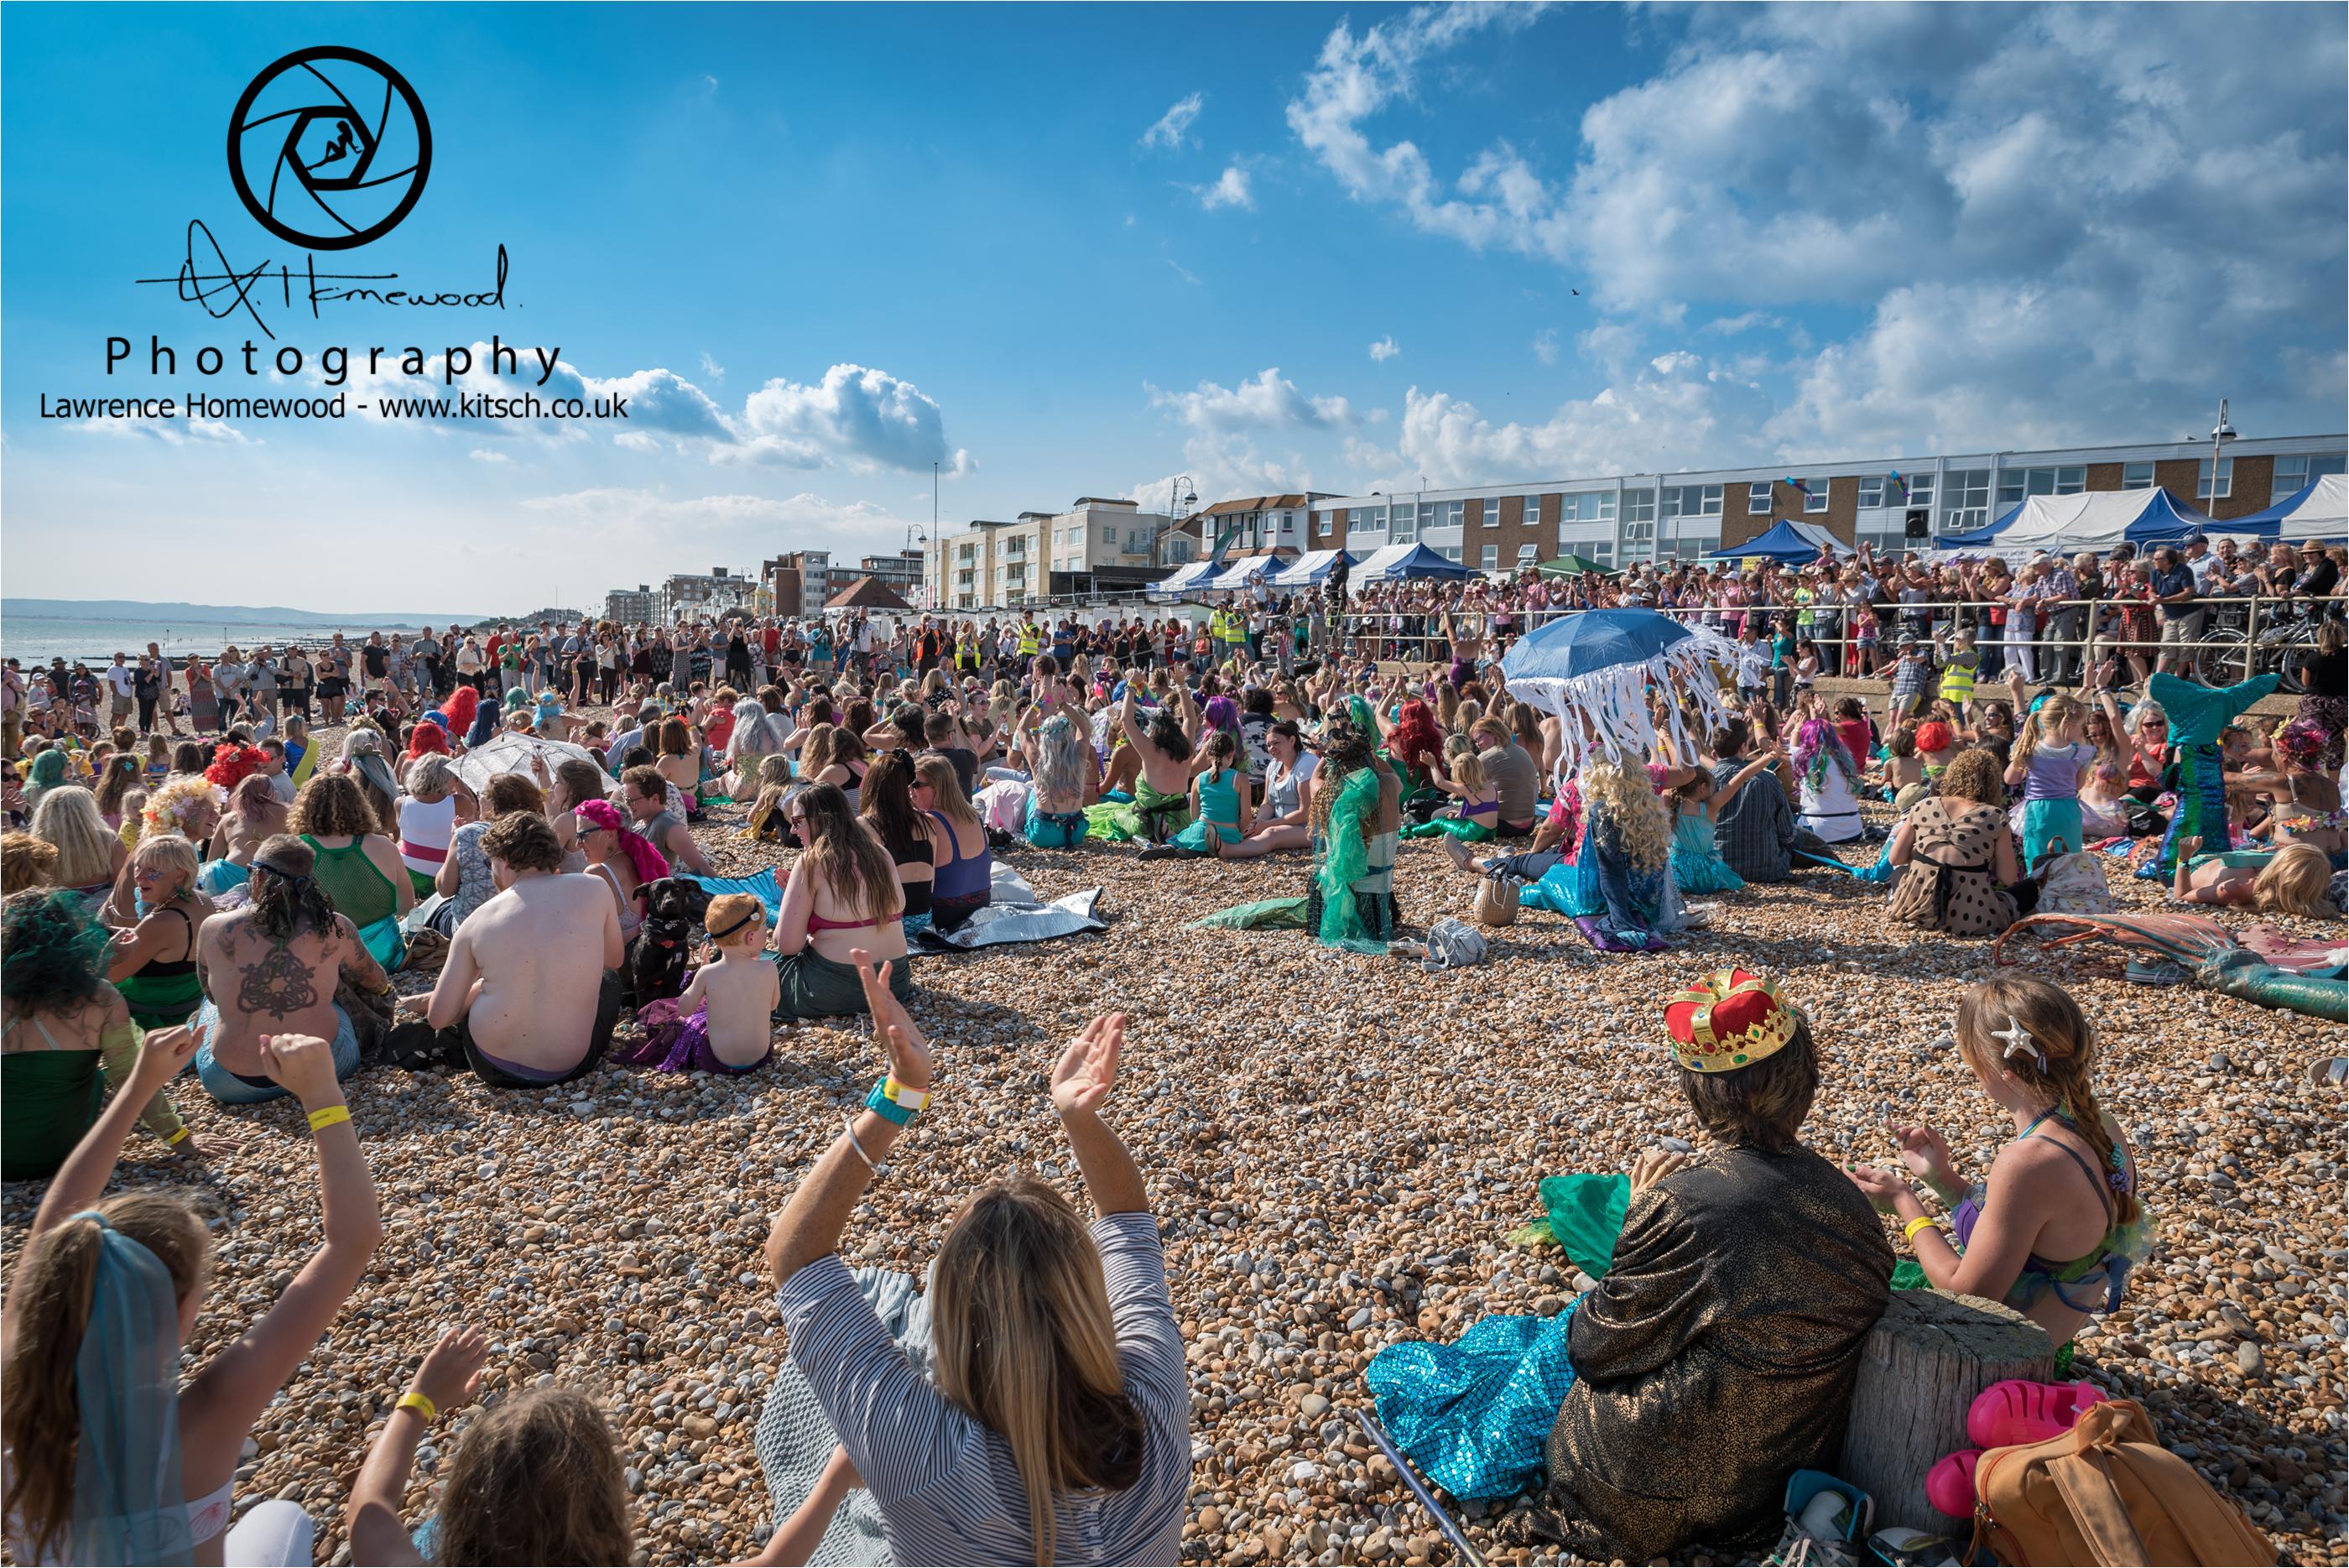 Largest Mermaid Gathering